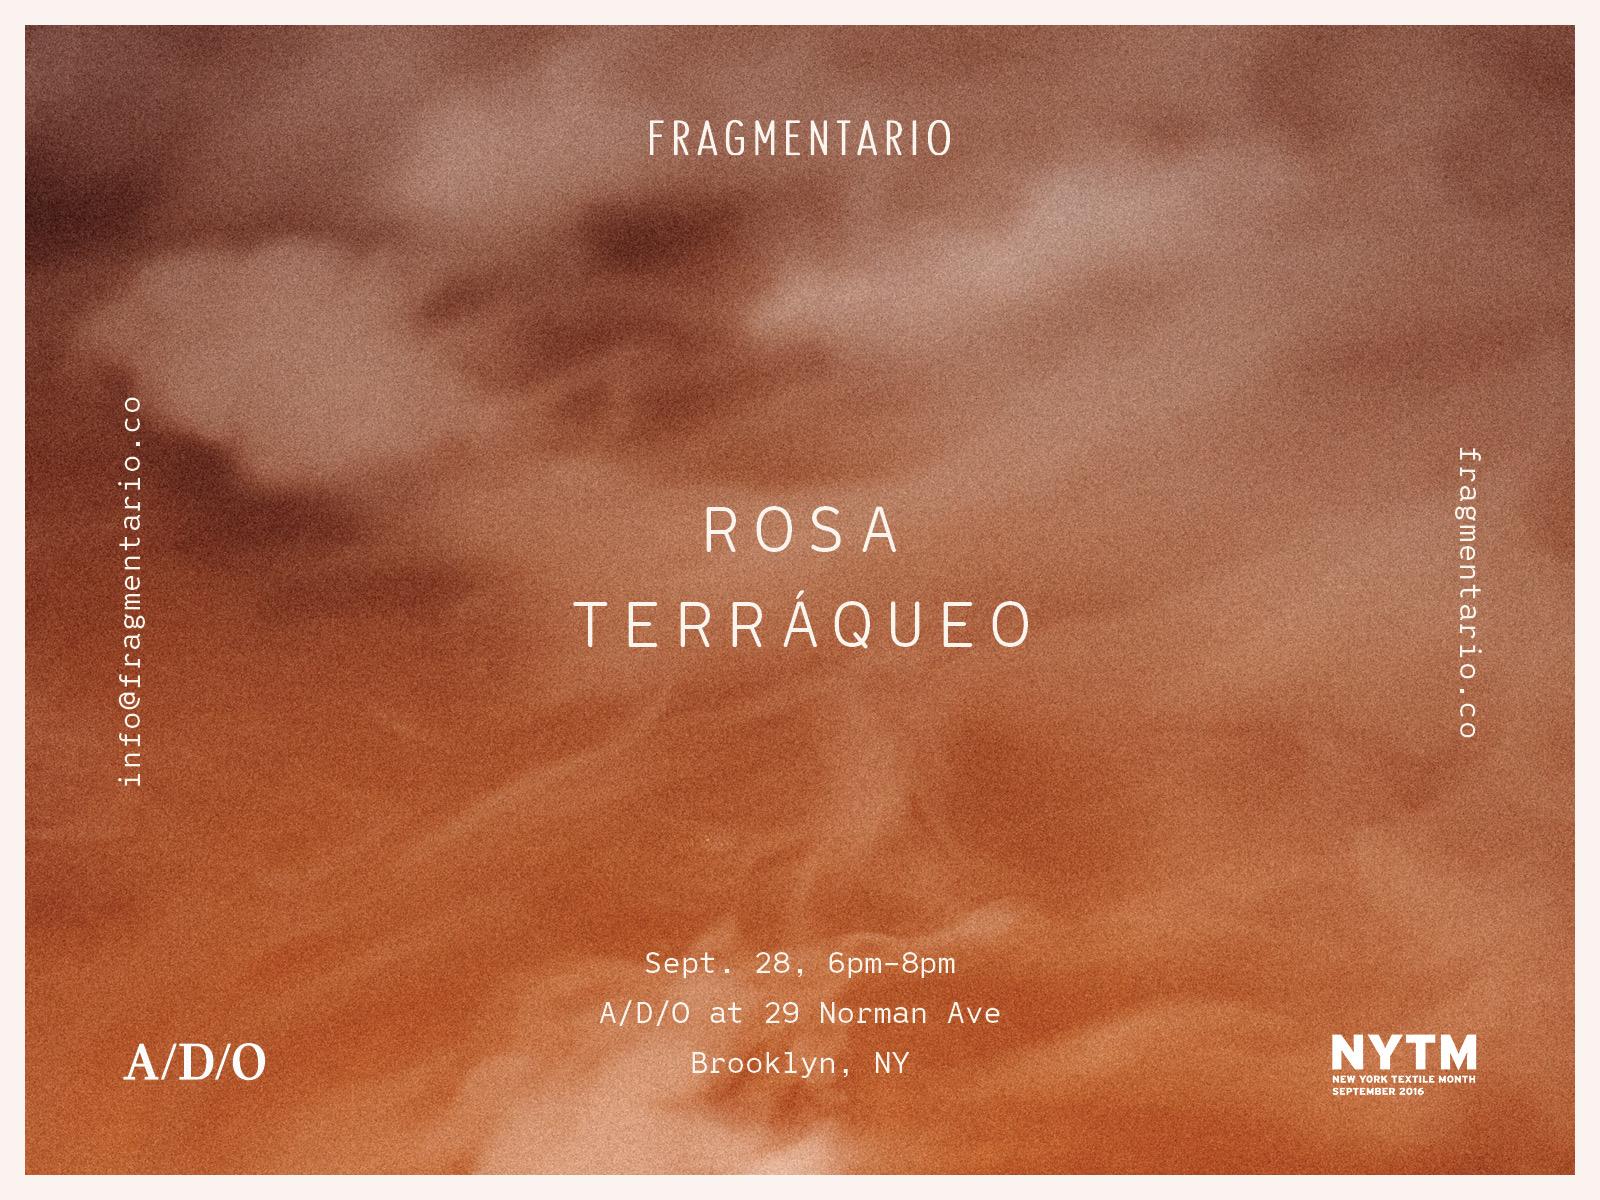 rosa-terraqueo-presentation-landscape-logos.jpg